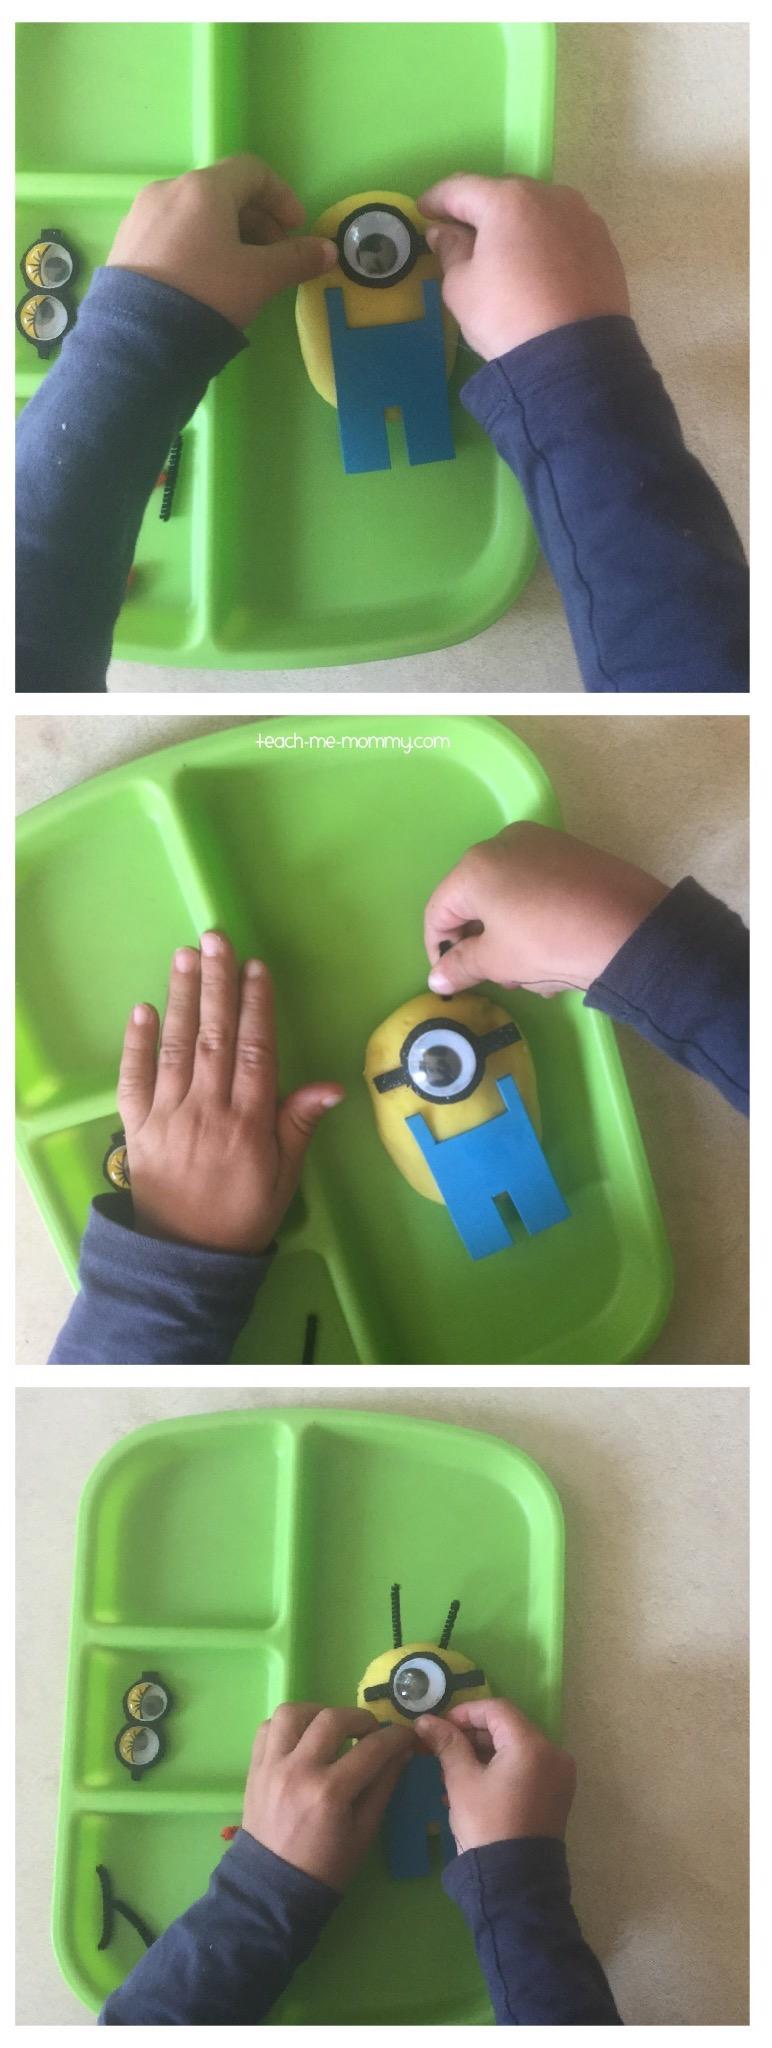 Building a minion